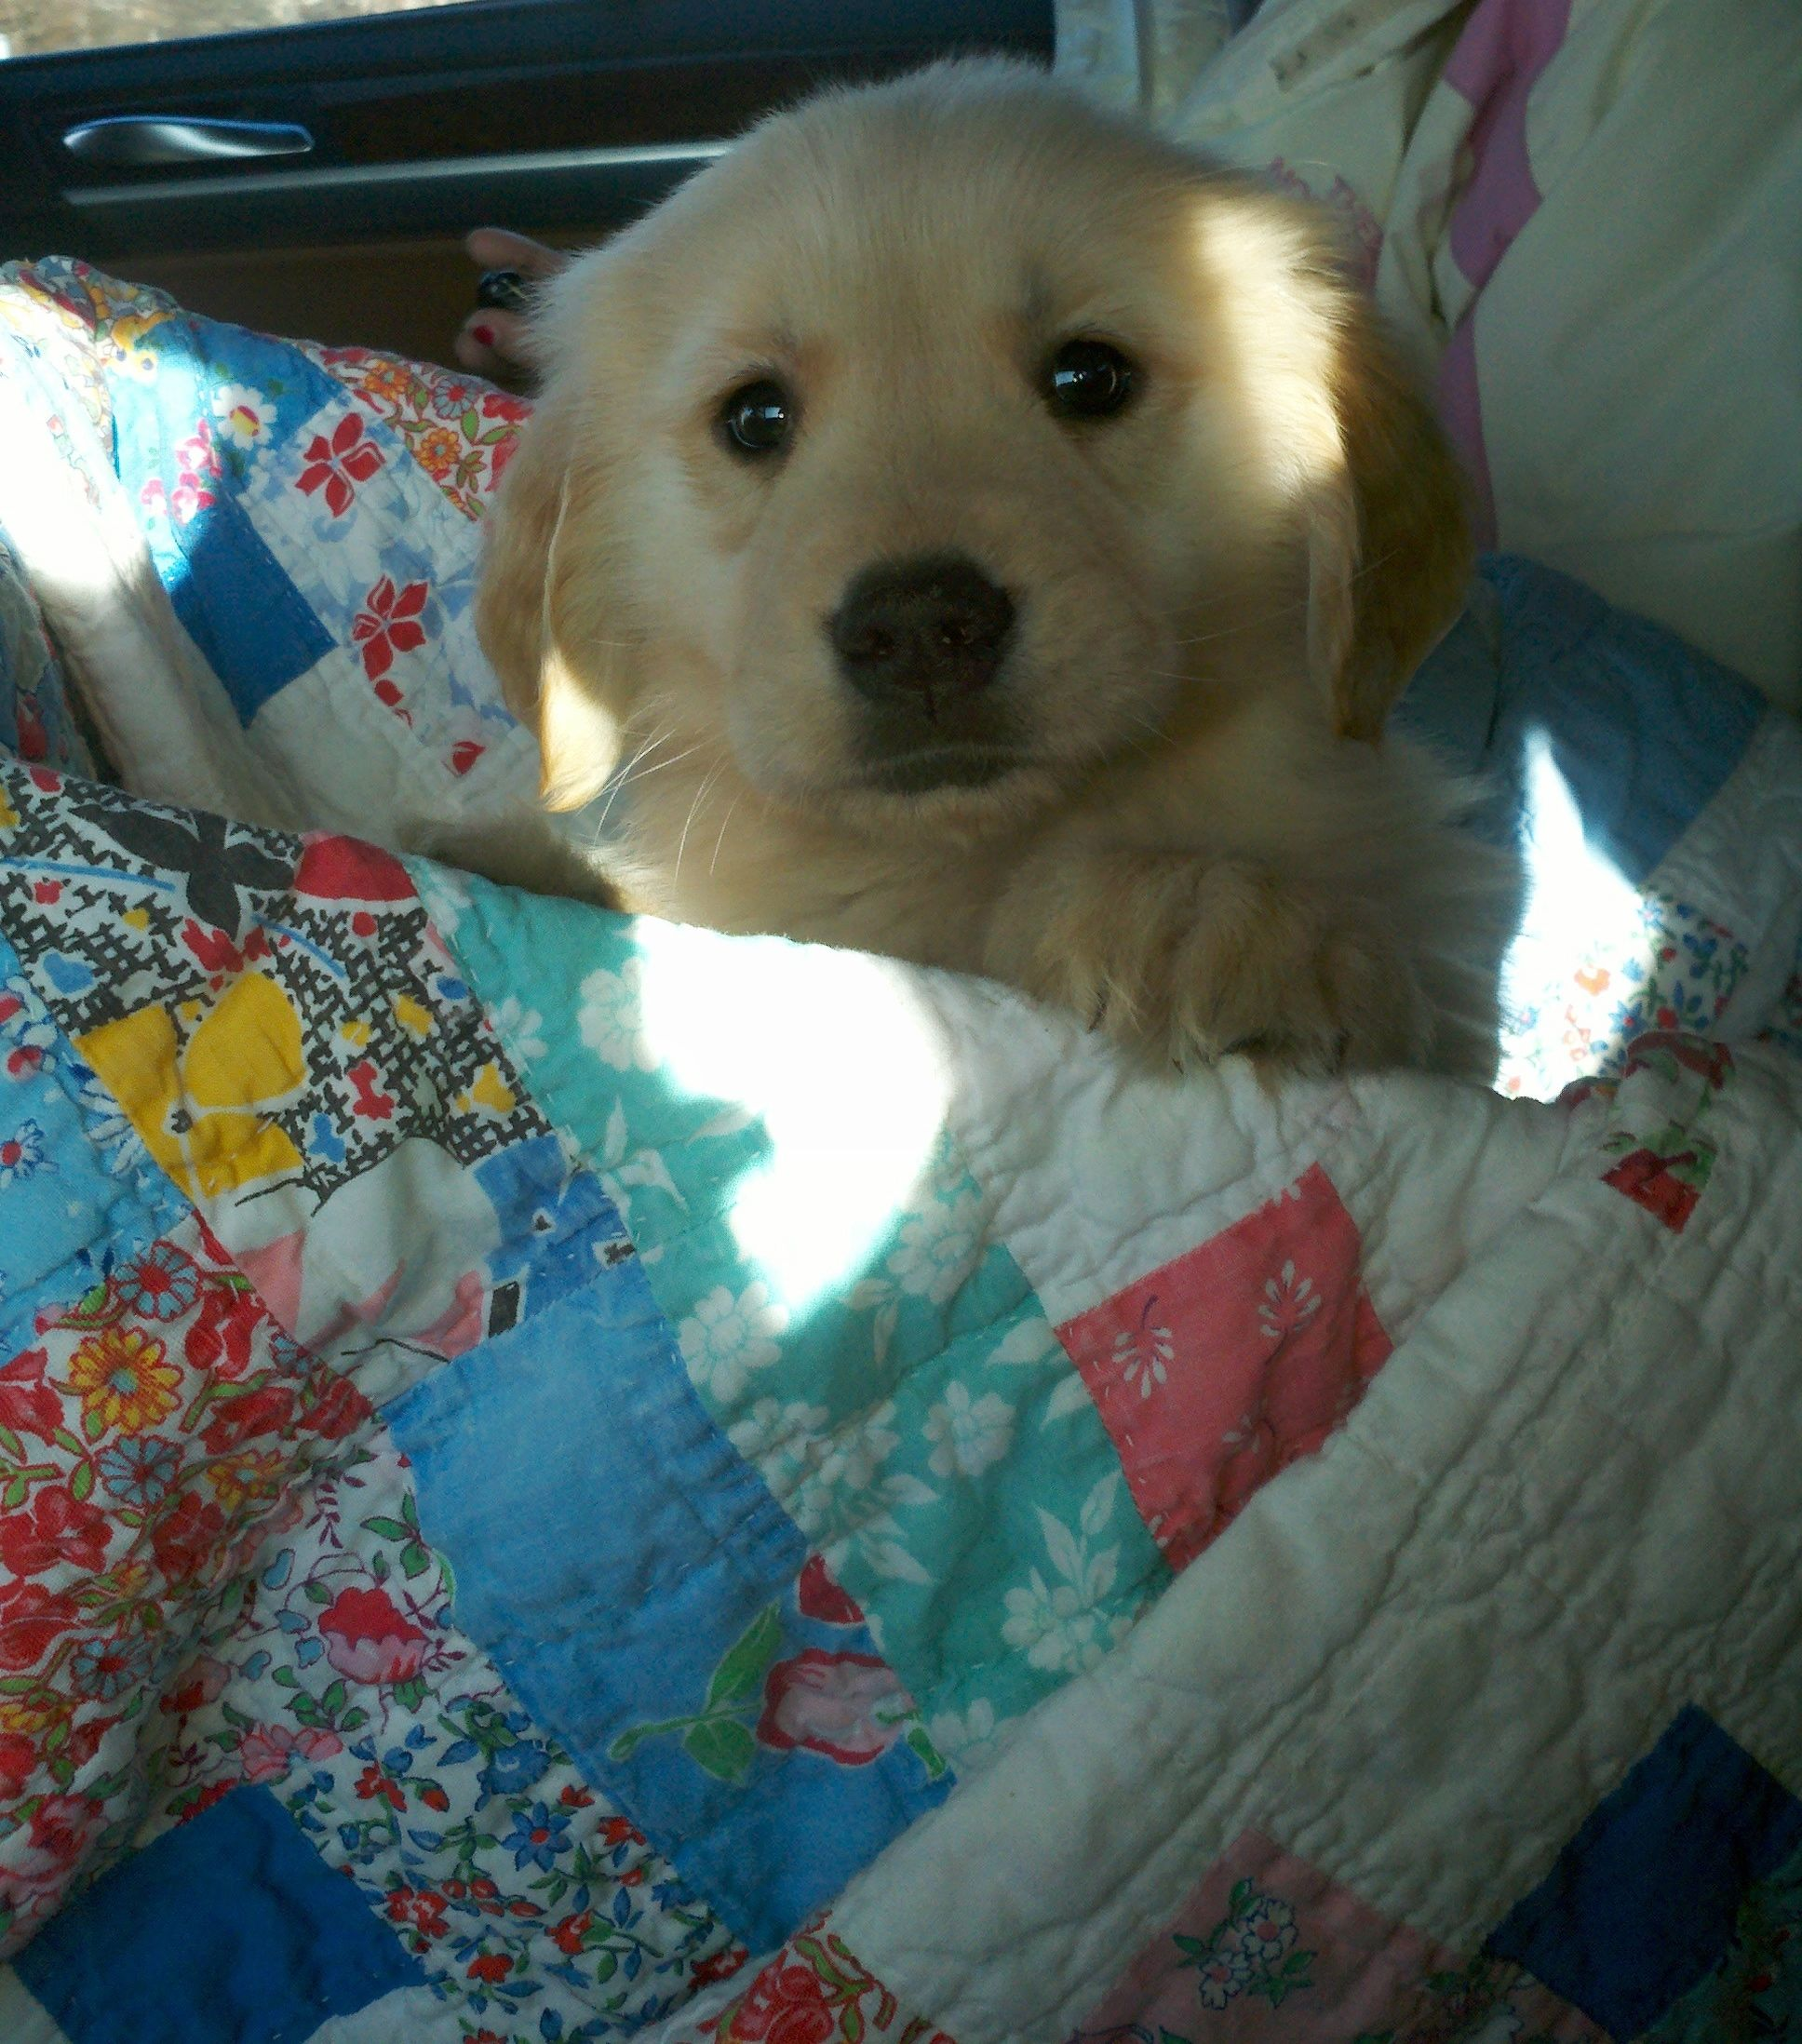 Golden Retriever Puppy...in a box Golden retriever puppy